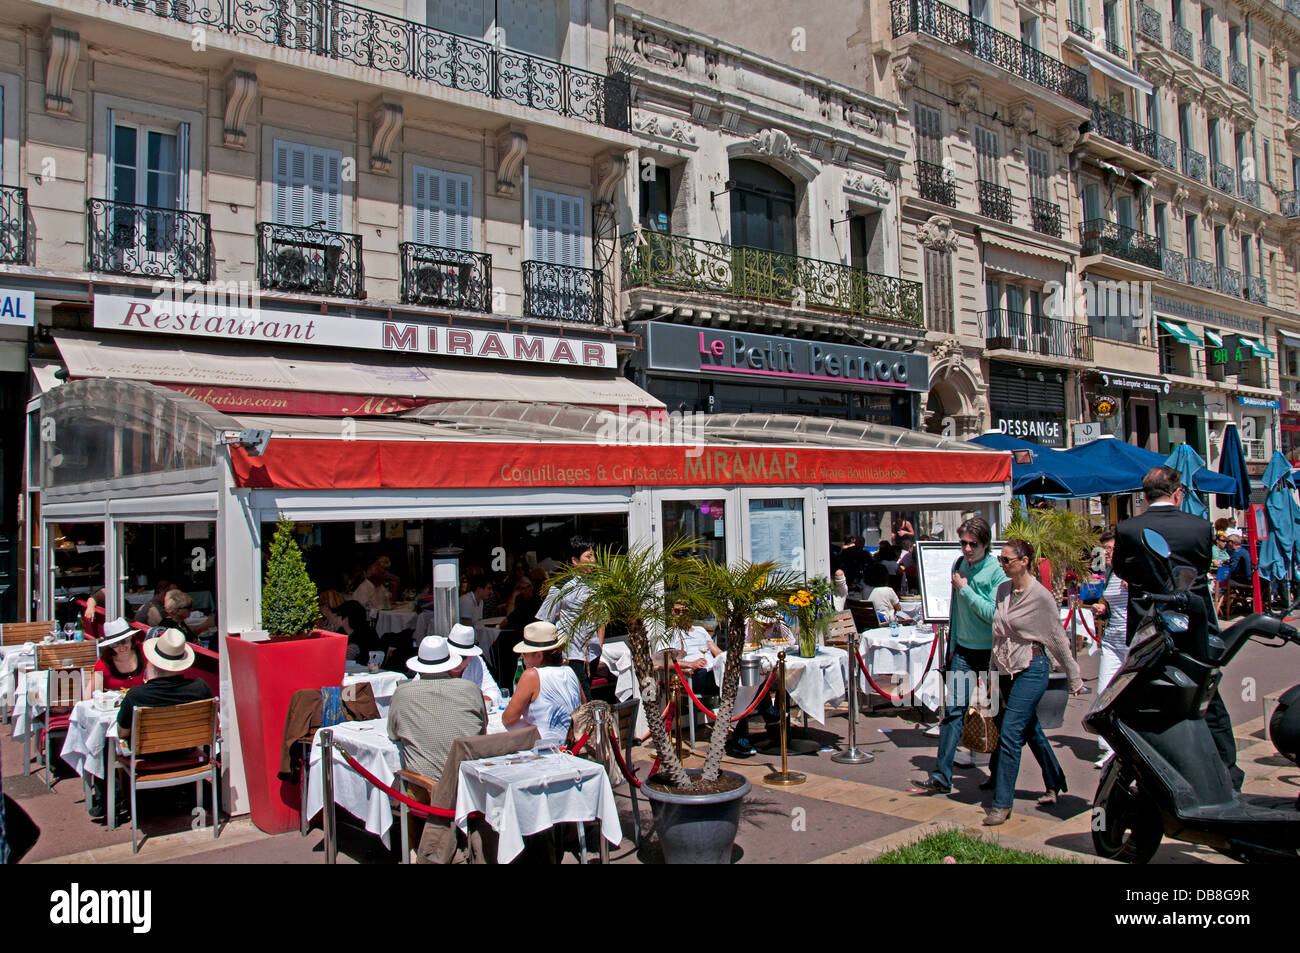 Miramar bouillabaisse restaurant caf bar pub vieux vieux - Au vieux port restaurant marseille ...